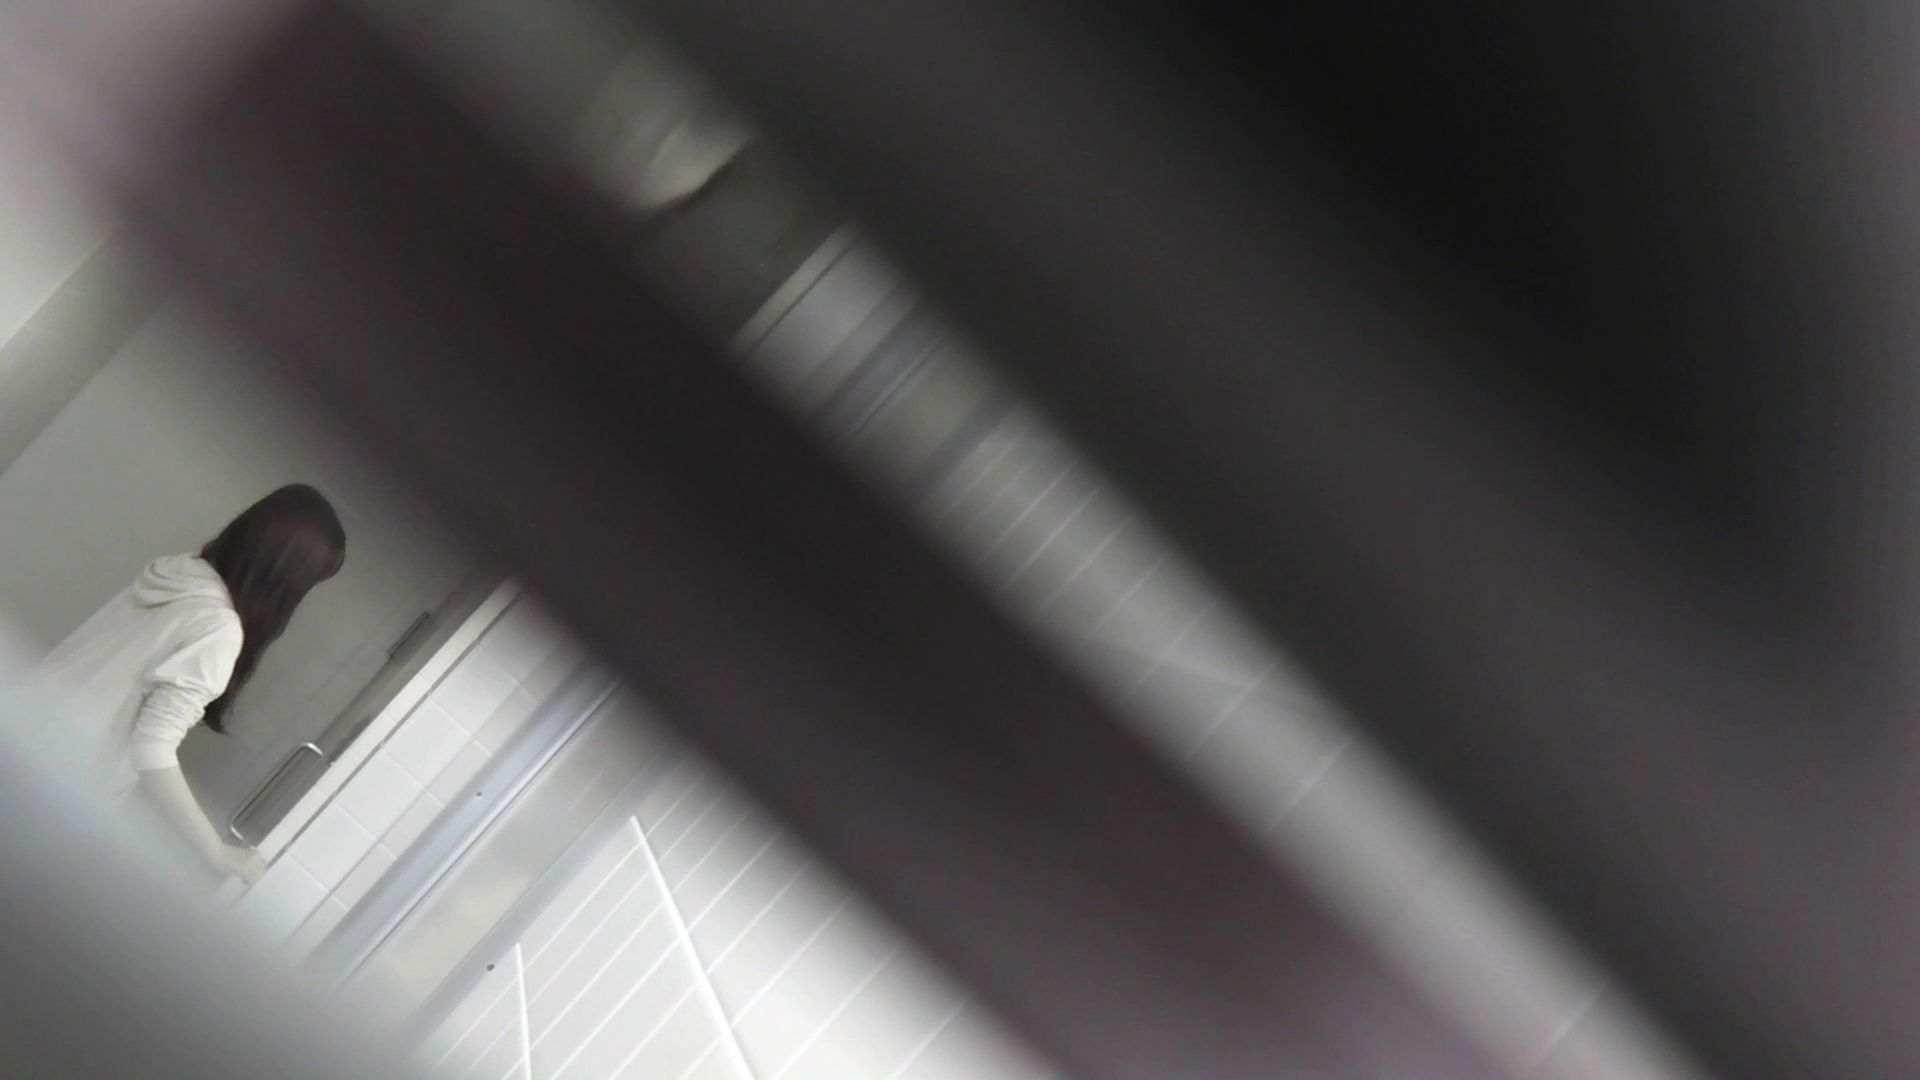 vol.09 命がけ潜伏洗面所! 残念!パンツについちゃいました。 パンツ大放出 盗み撮りオマンコ動画キャプチャ 91pic 83